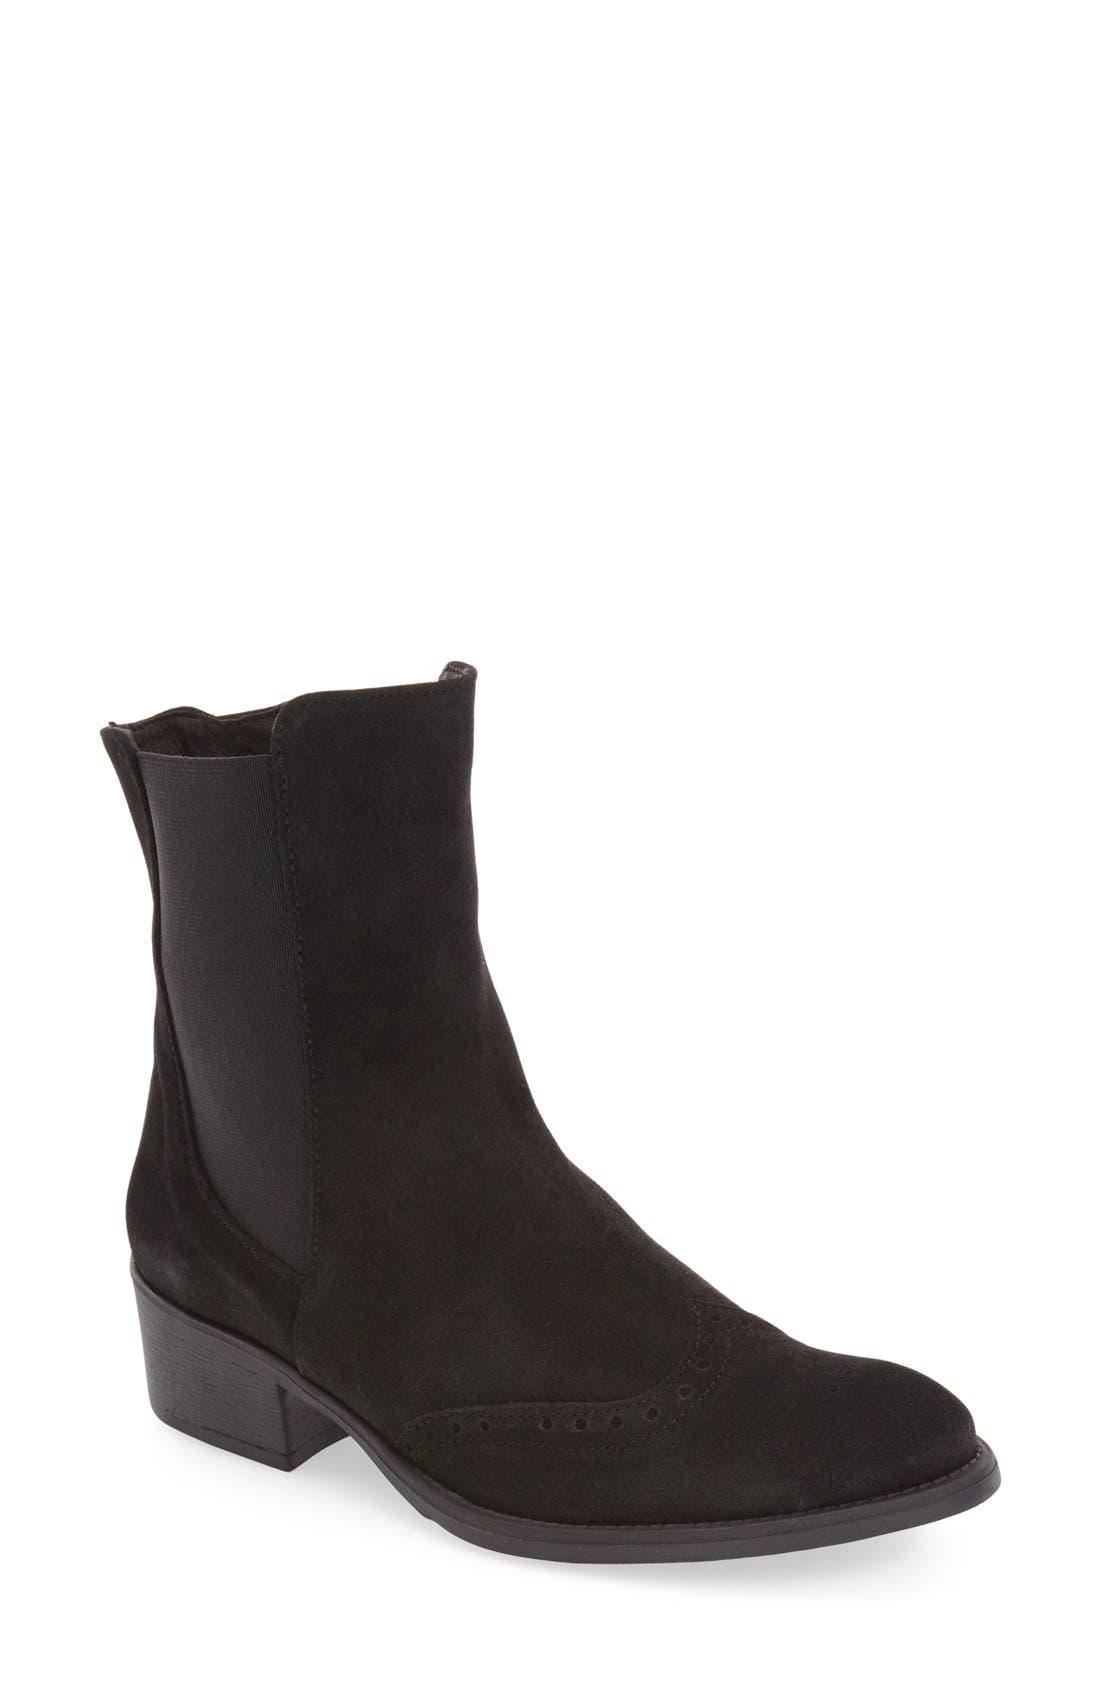 'Trieste' Chelsea Boot,                         Main,                         color, Black Suede